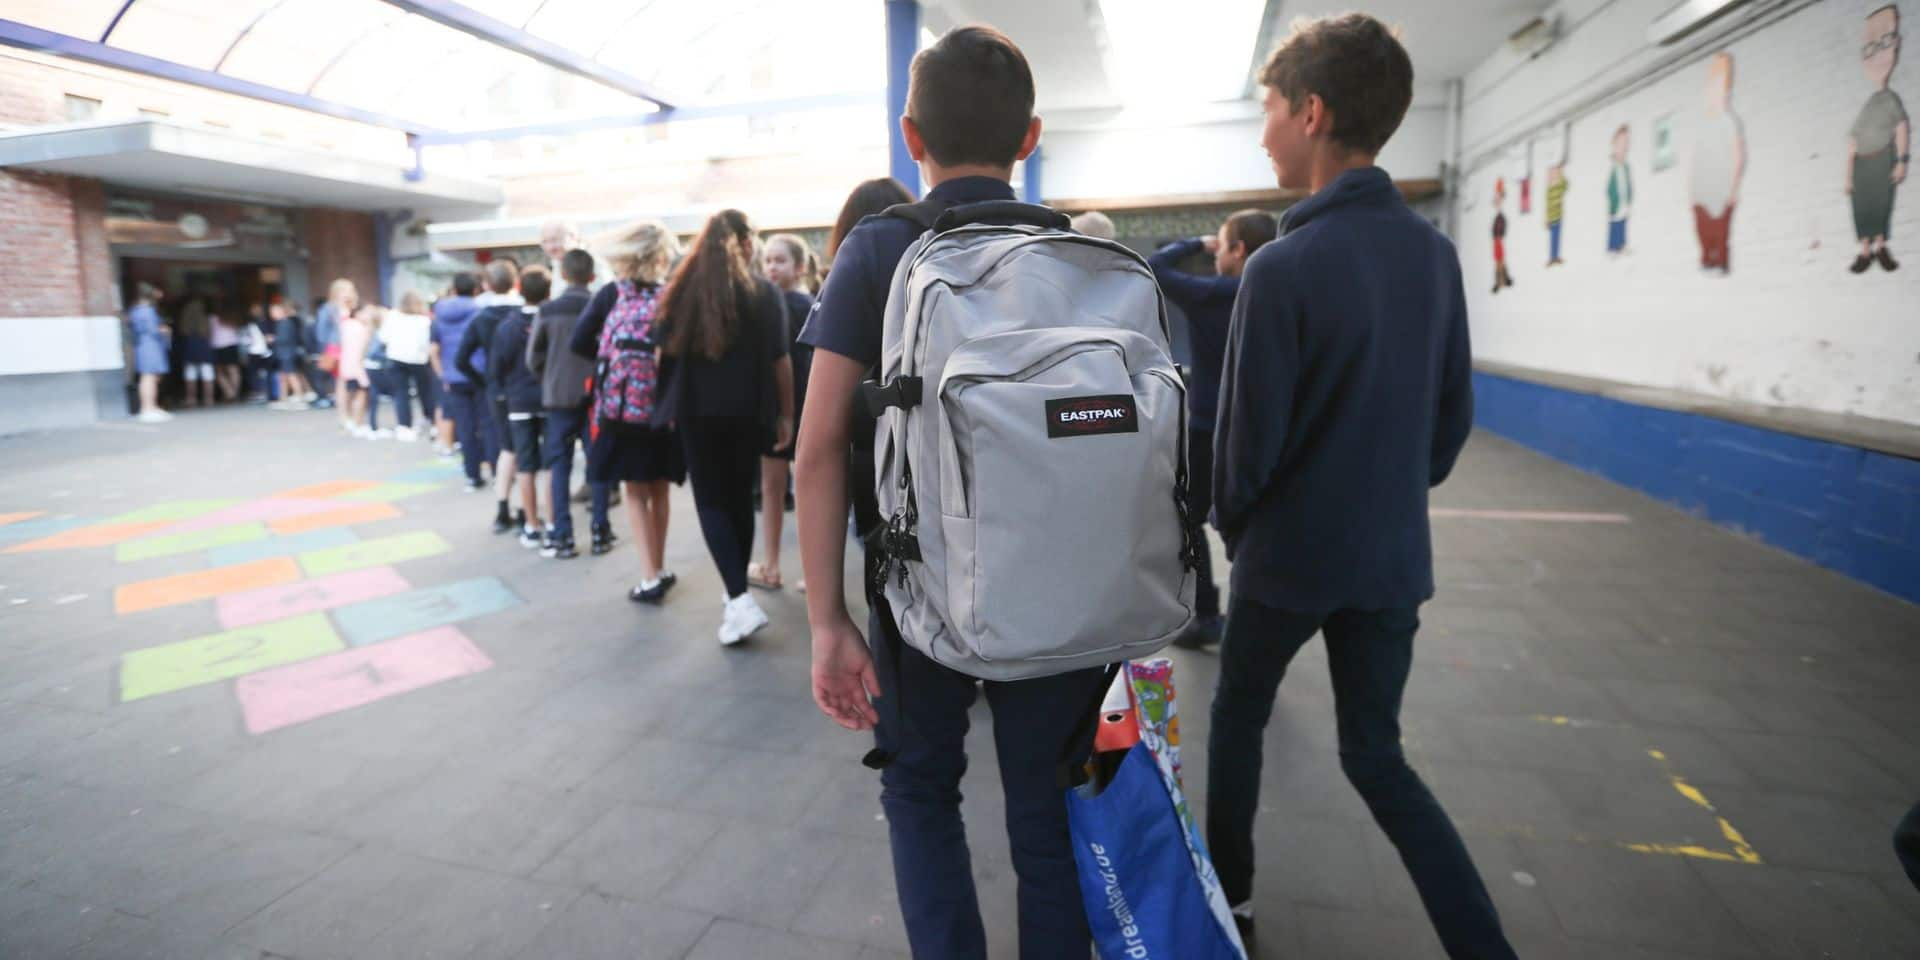 Ecole discriminante attend réformes d'urgence...